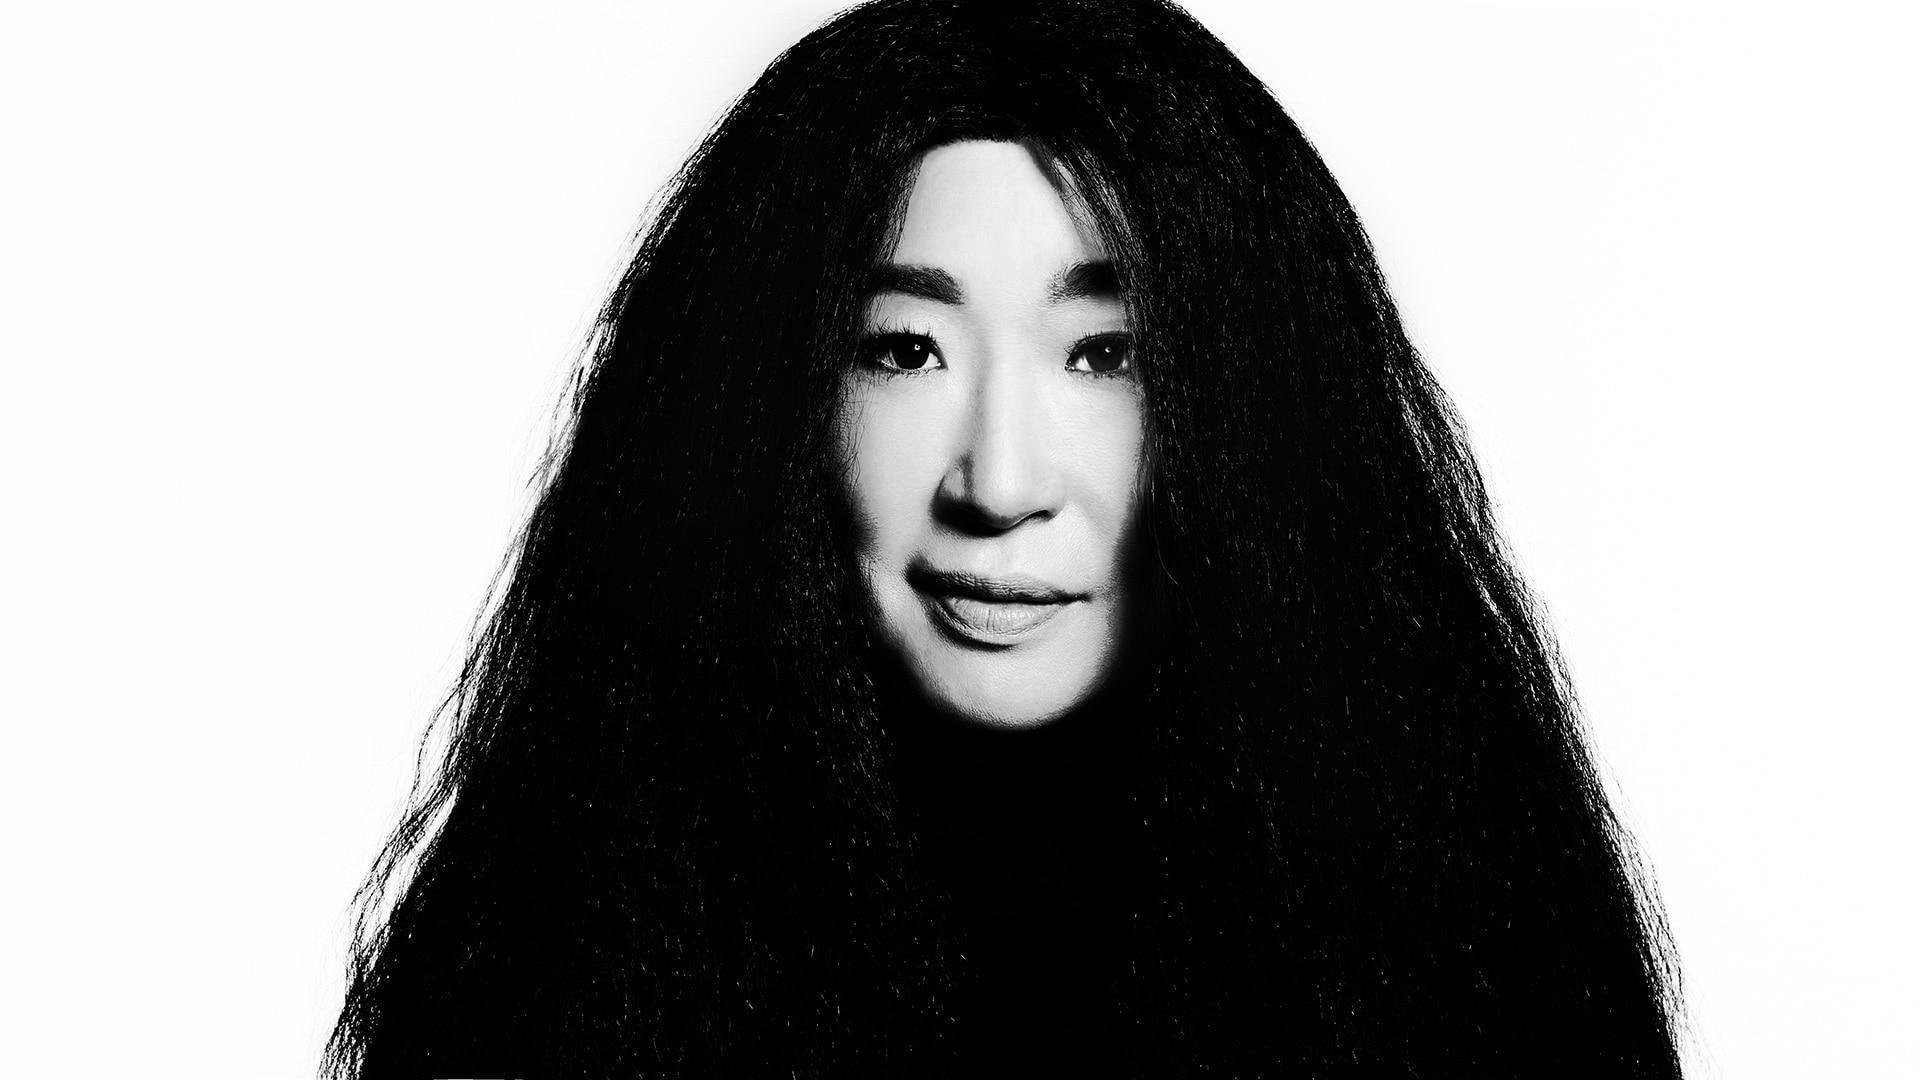 Sandra Oh: March 30, 2019